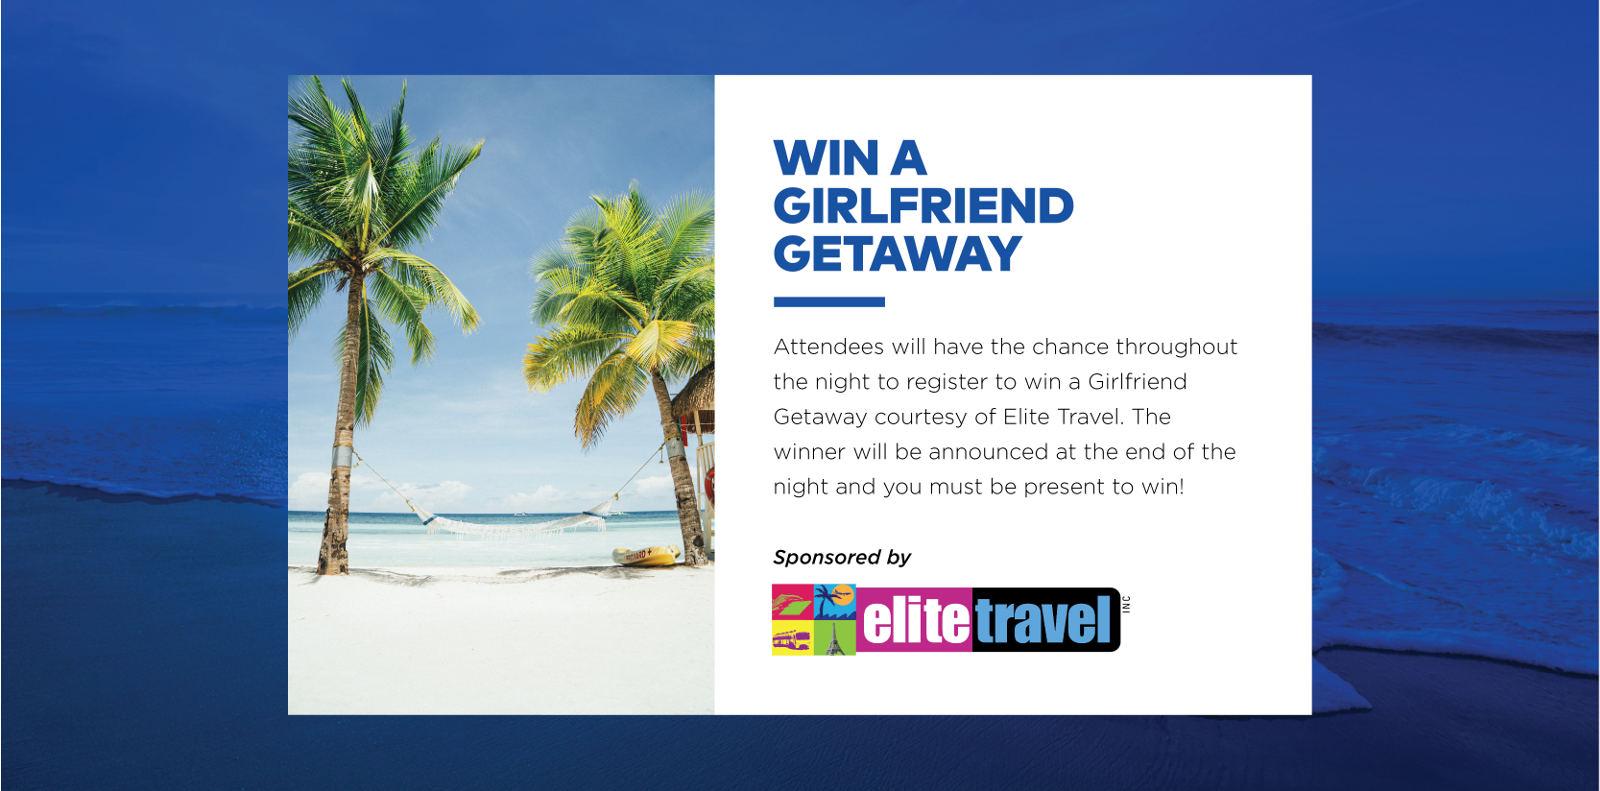 Win a Girlfriend Getaway - Sponsored by Elite Travel